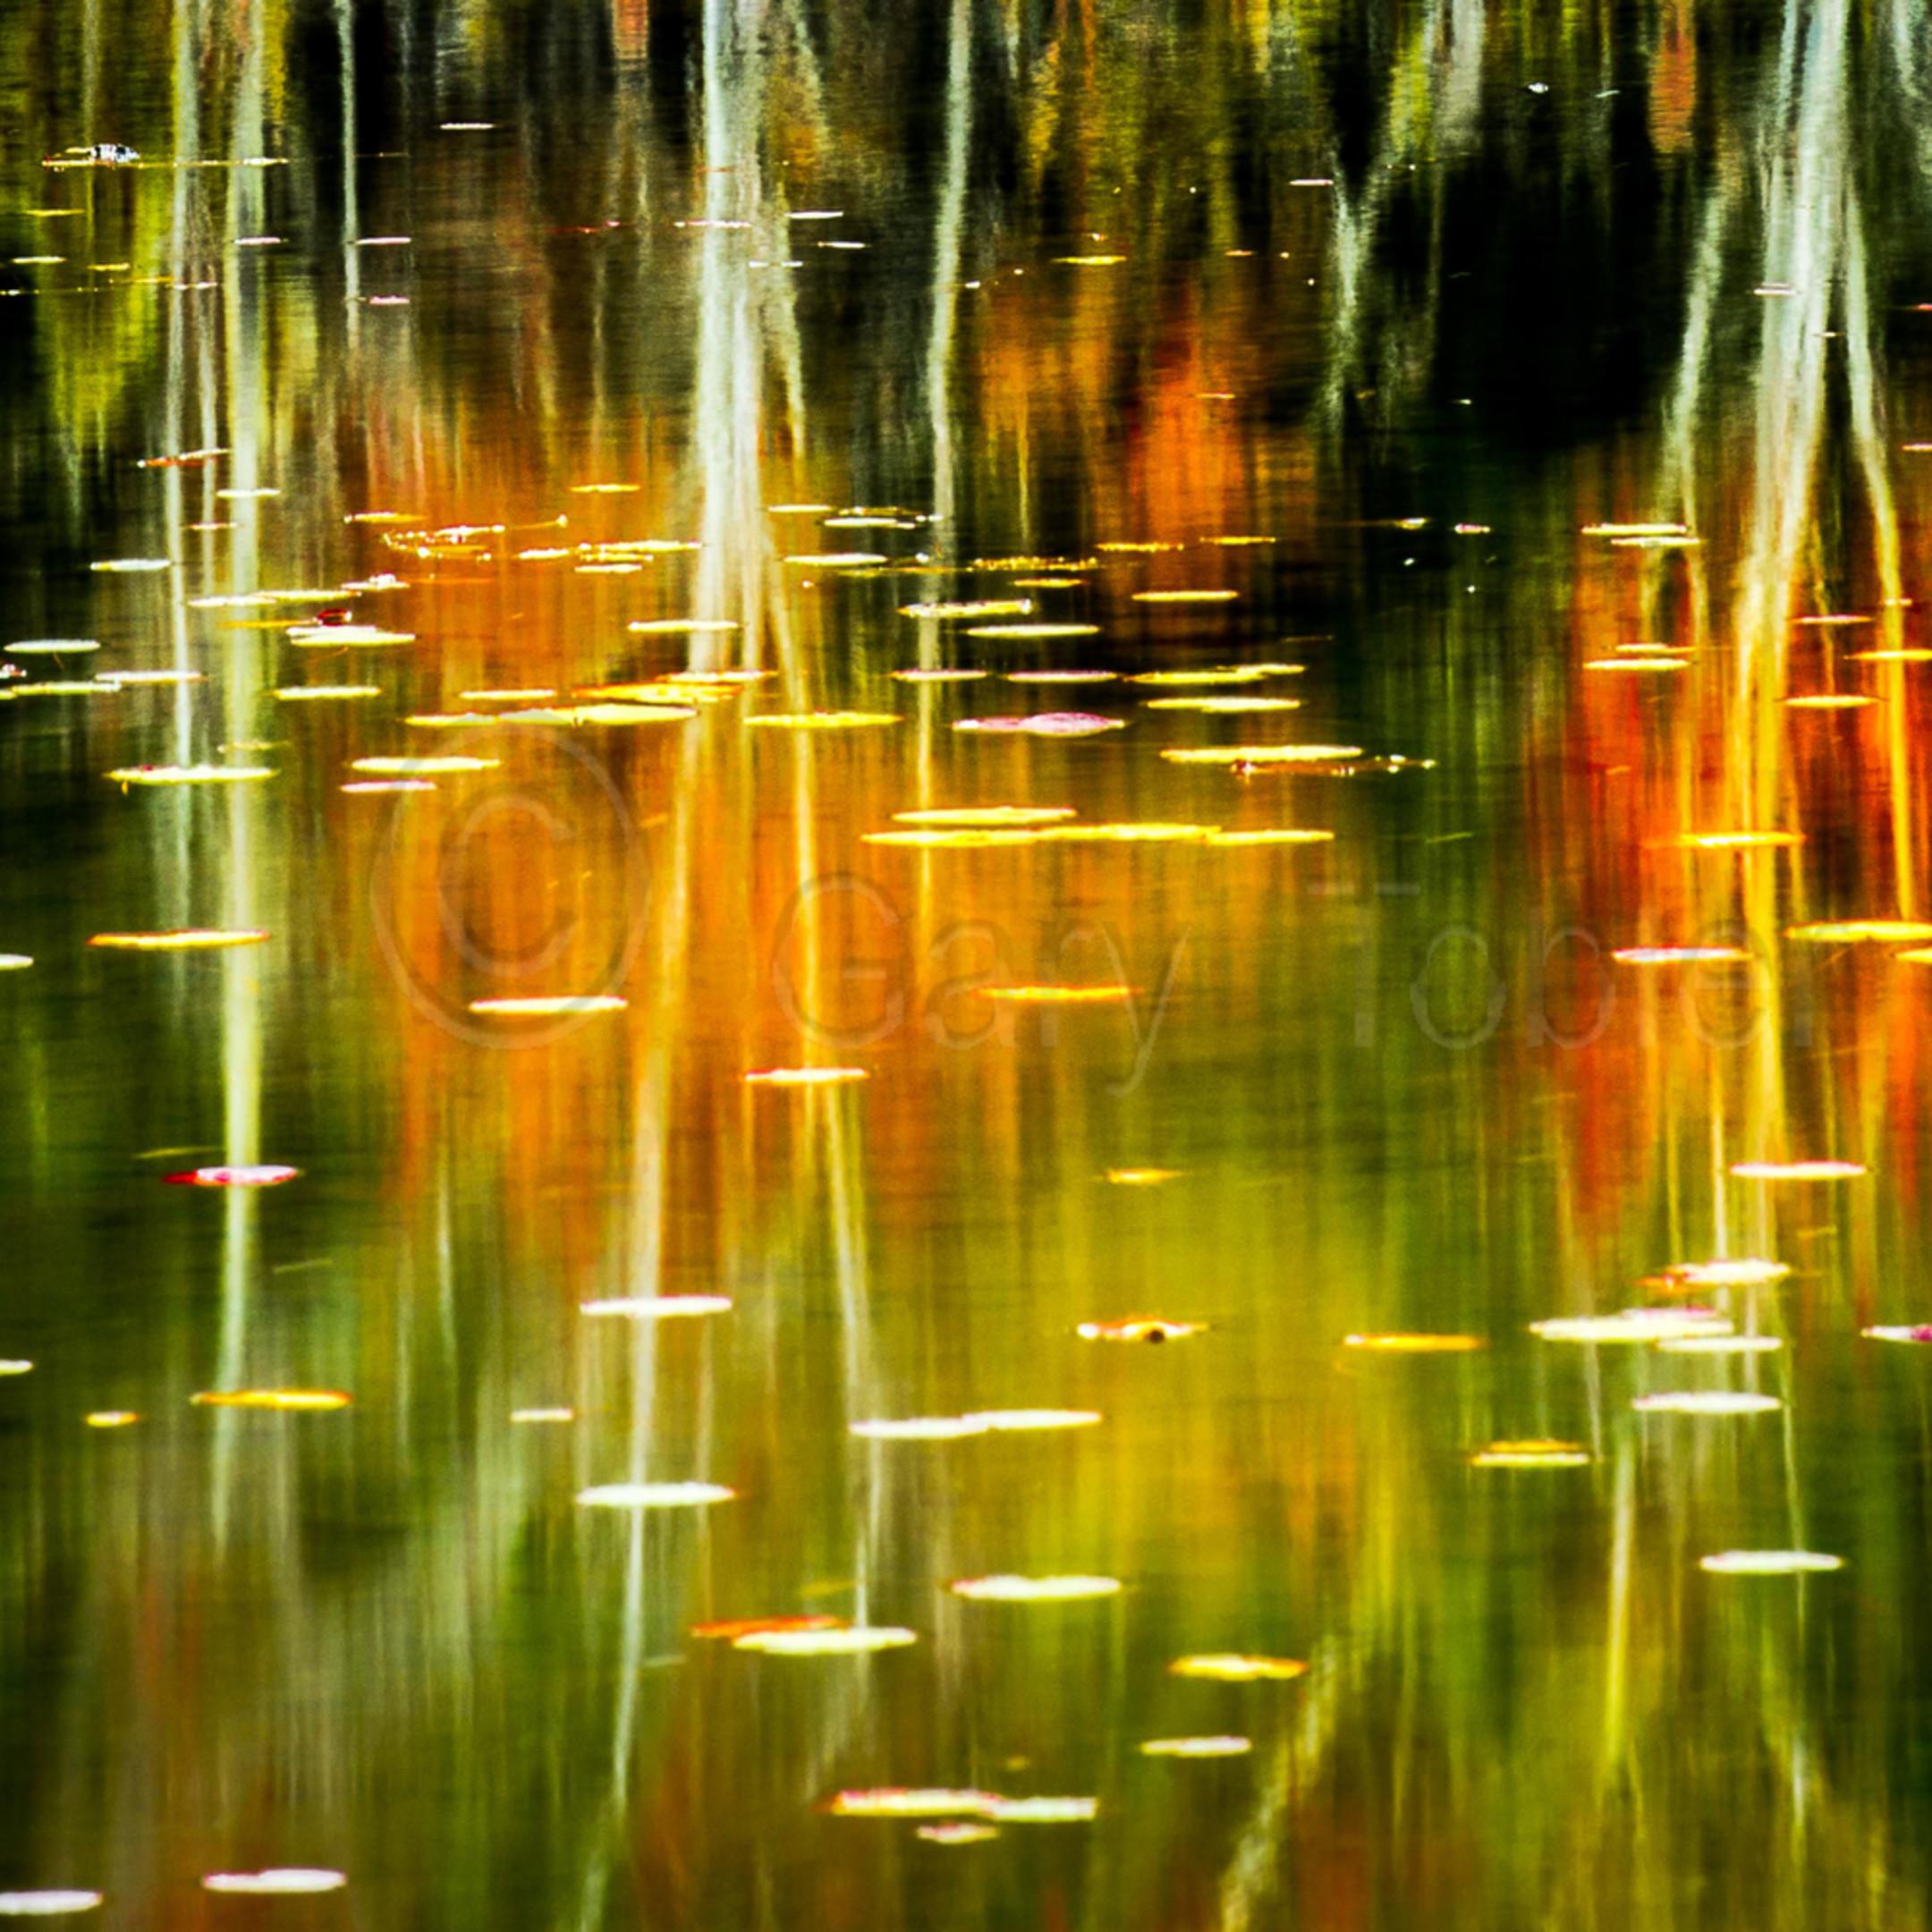 Vt reflections ydxvv3